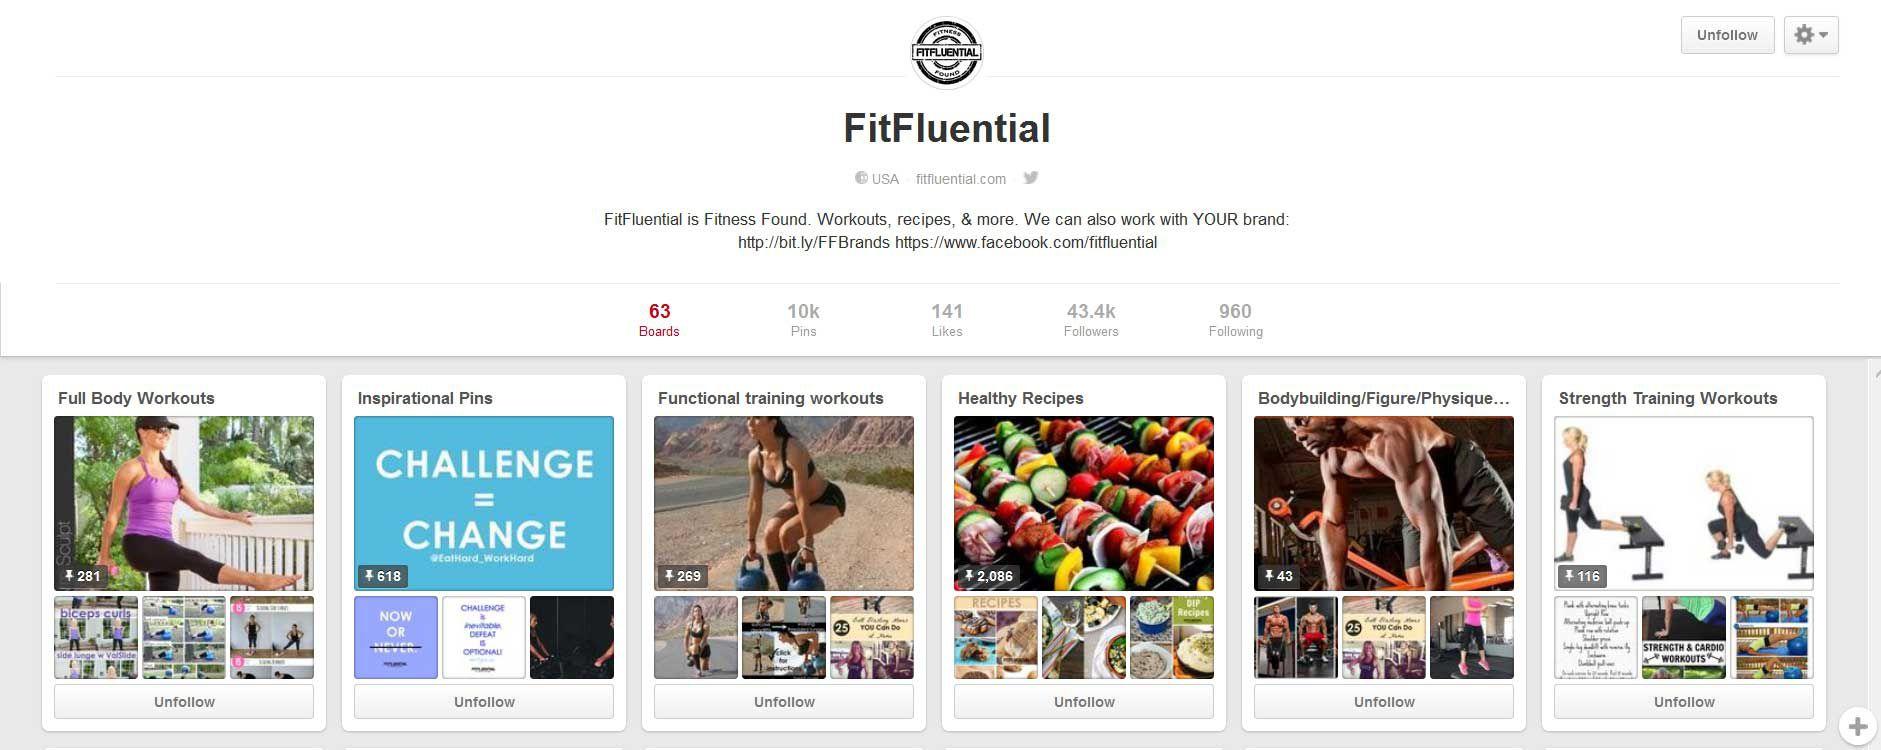 FitFluential Pinterest